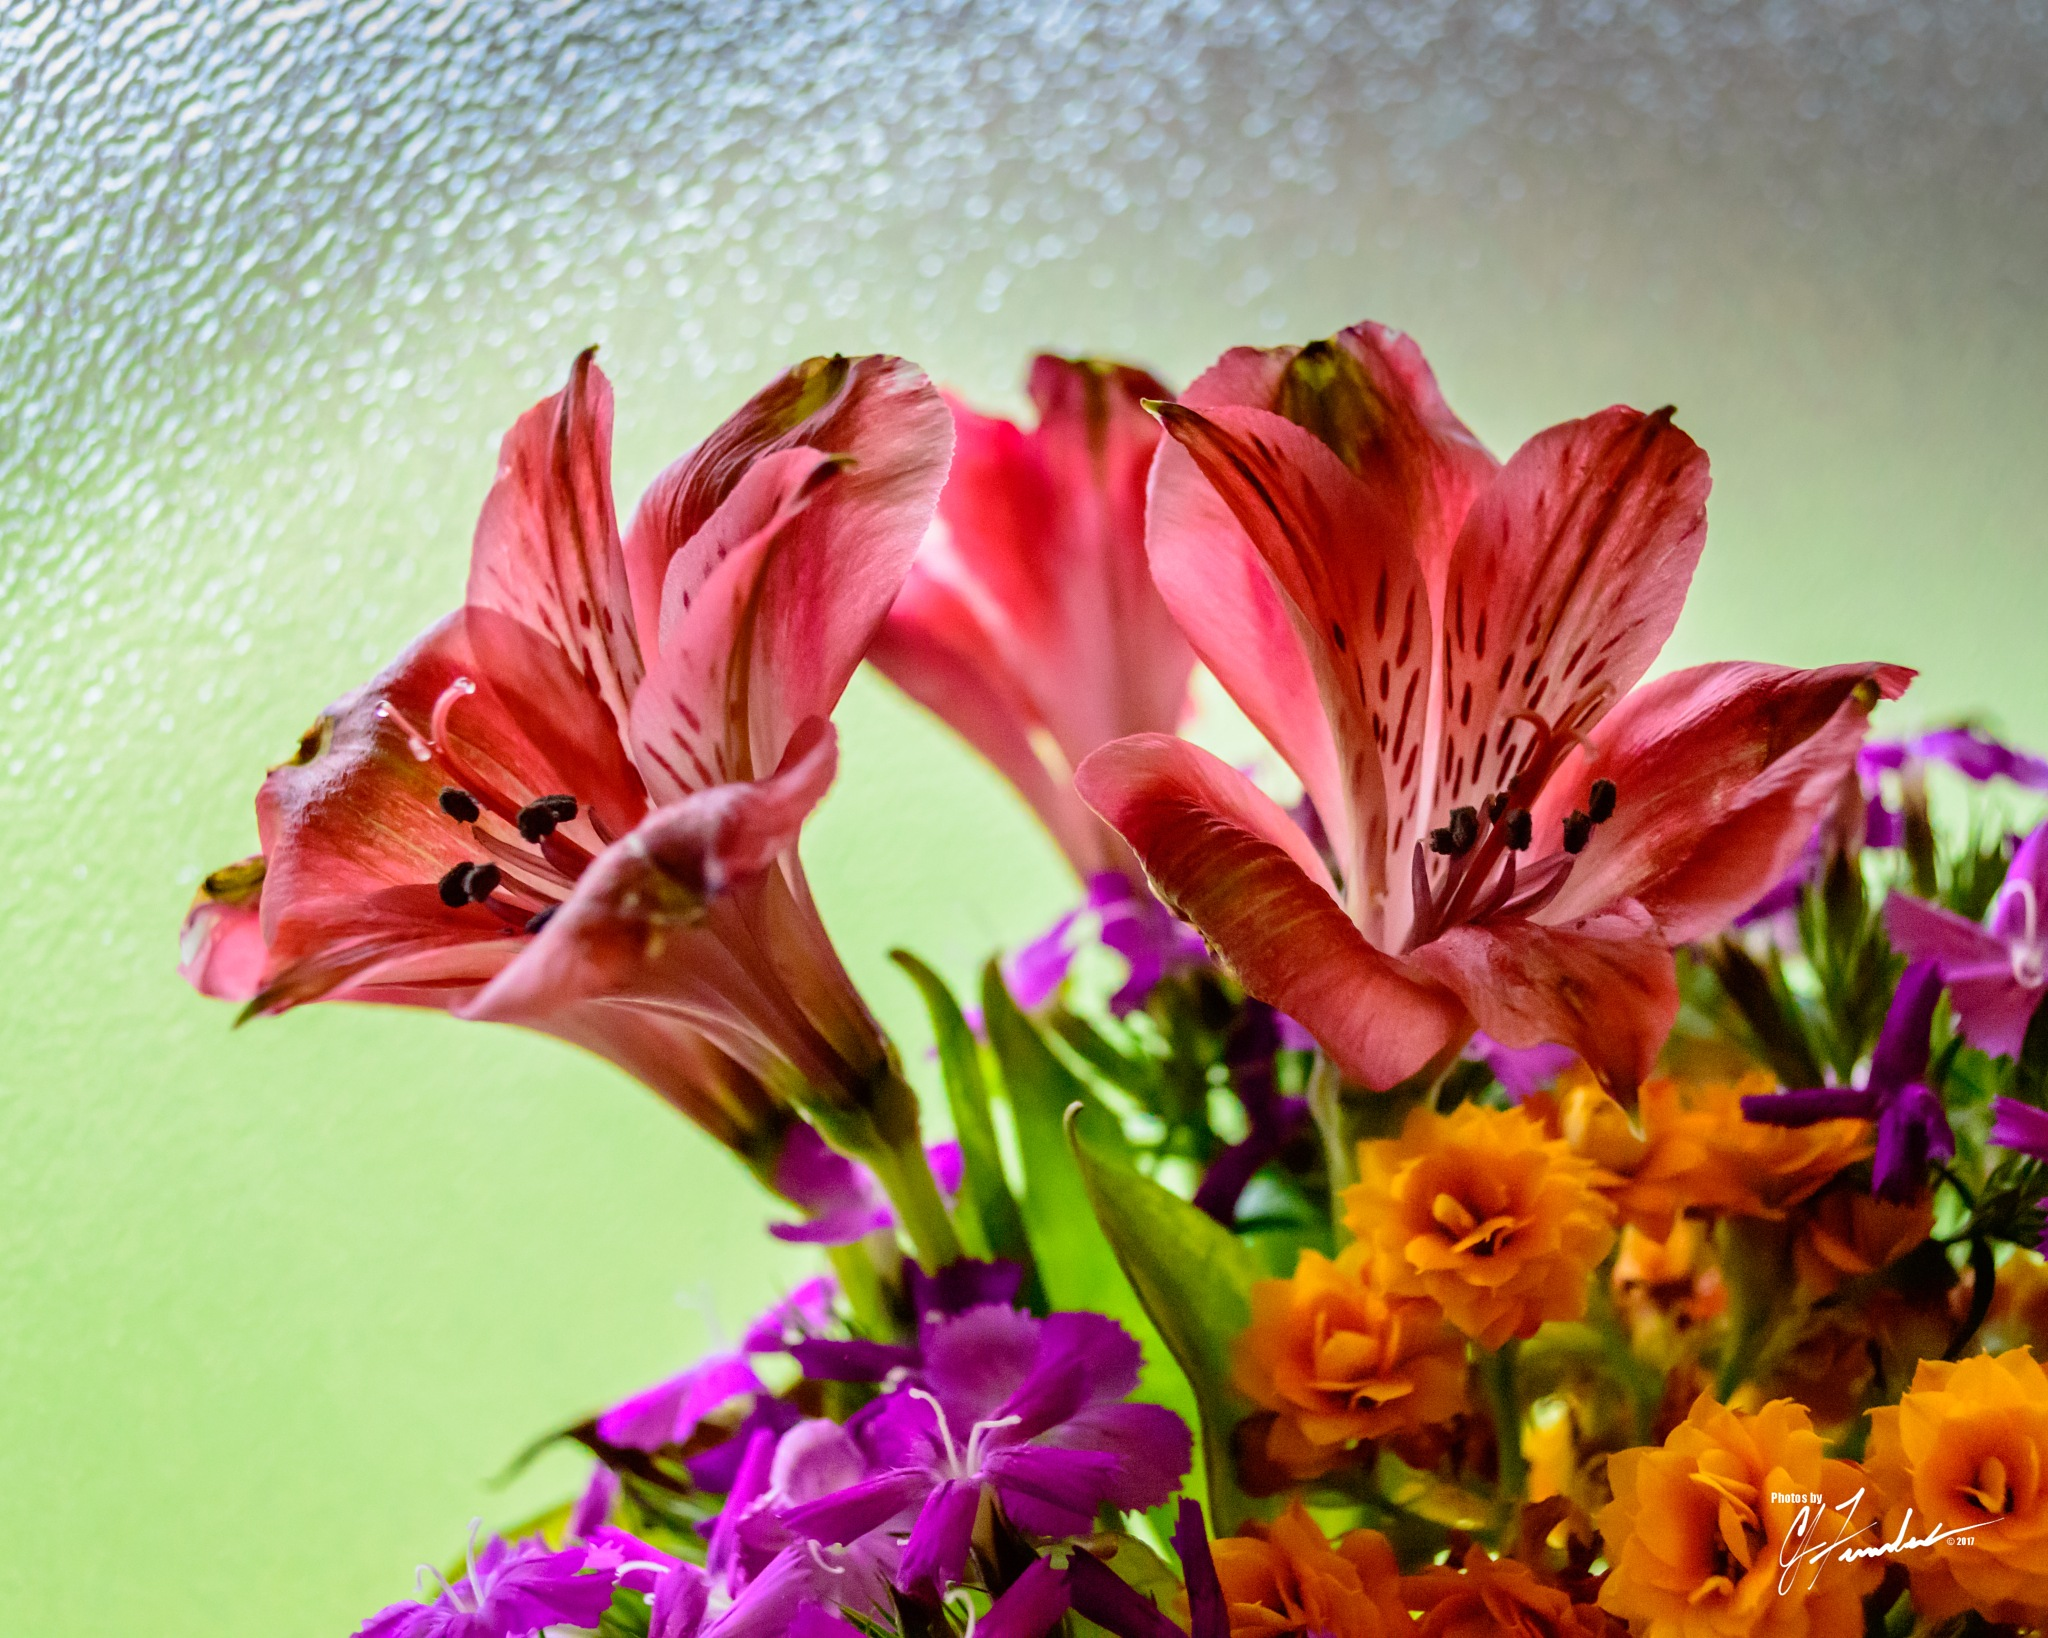 Spring Flowers by CJ Fenstermaker